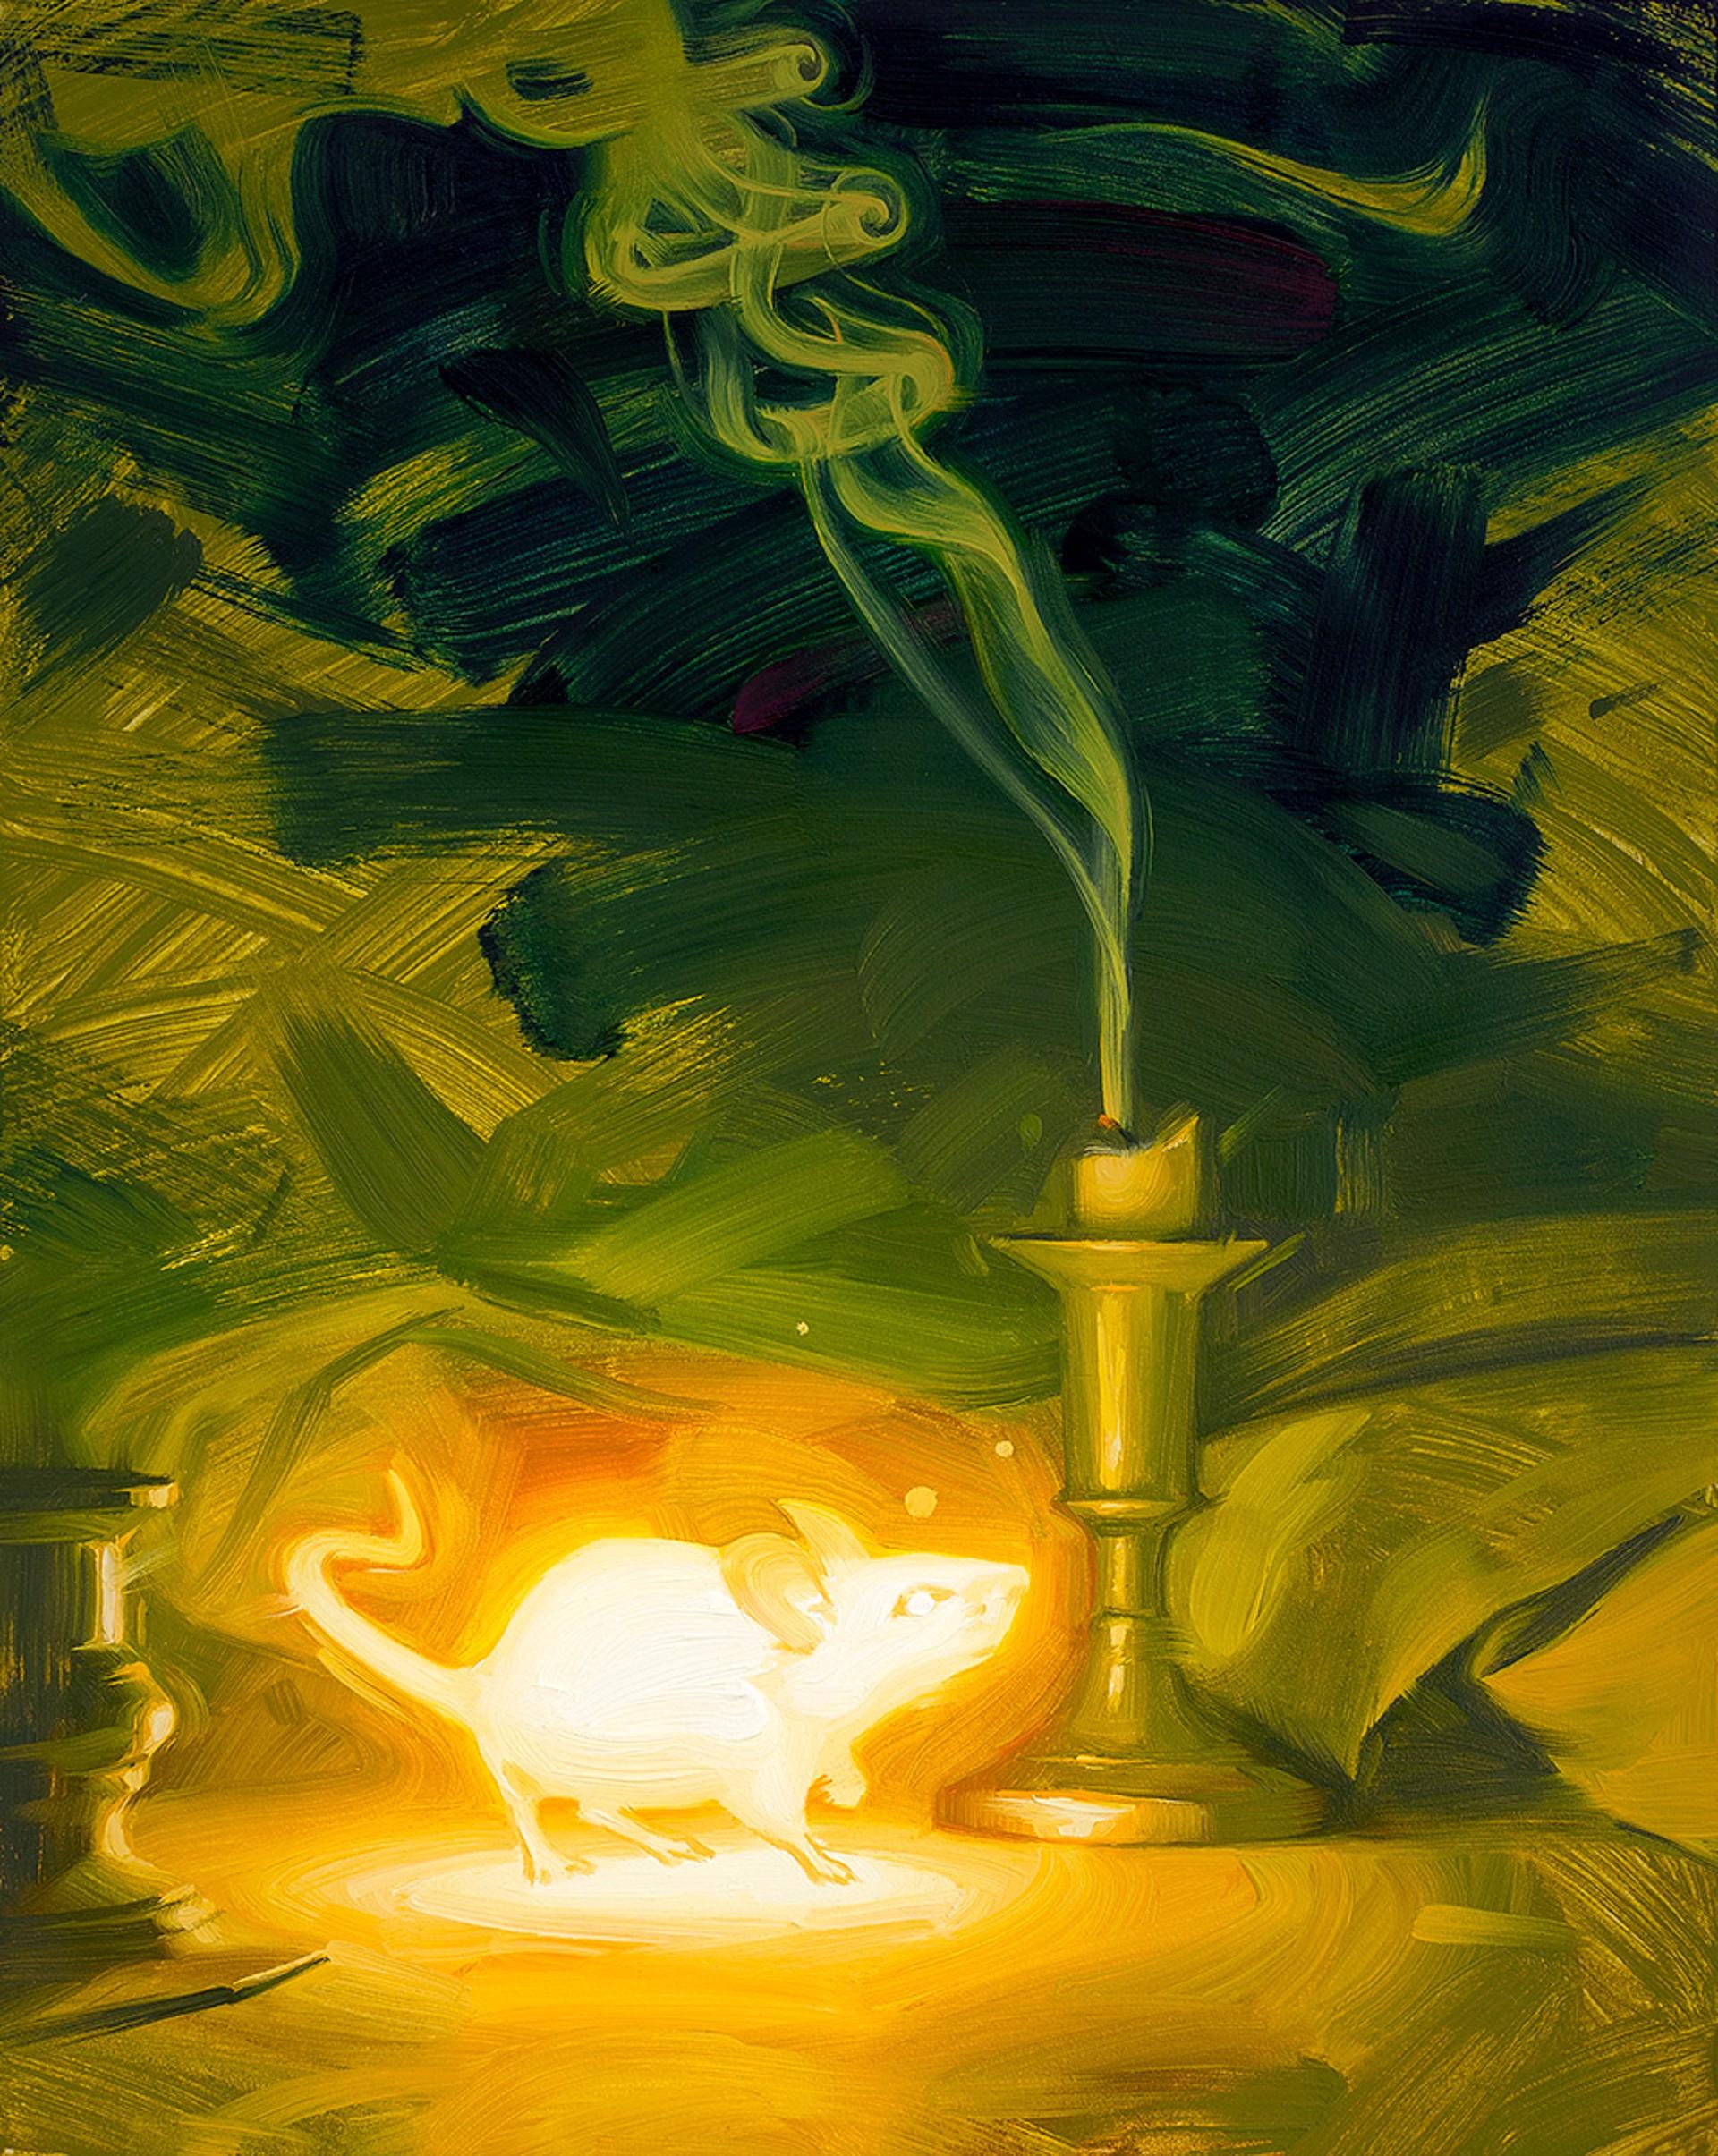 Bioluminescence 2 by Rob Rey